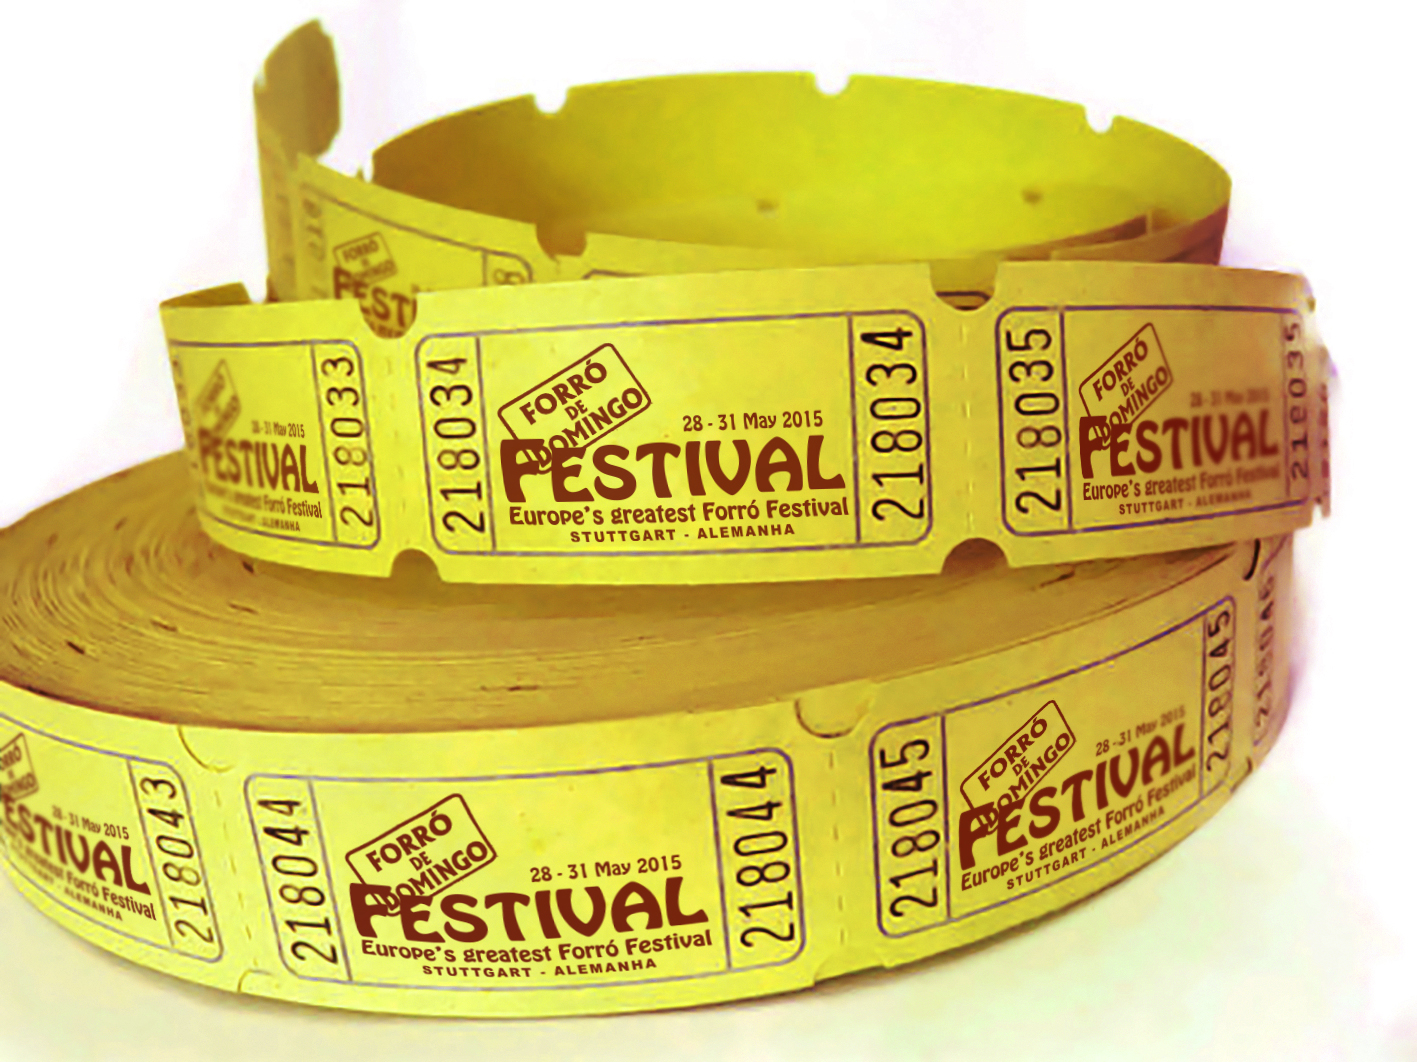 https://forrofestival.com/wp-content/uploads/2015/02/FdD-ticket_2-dias.jpg